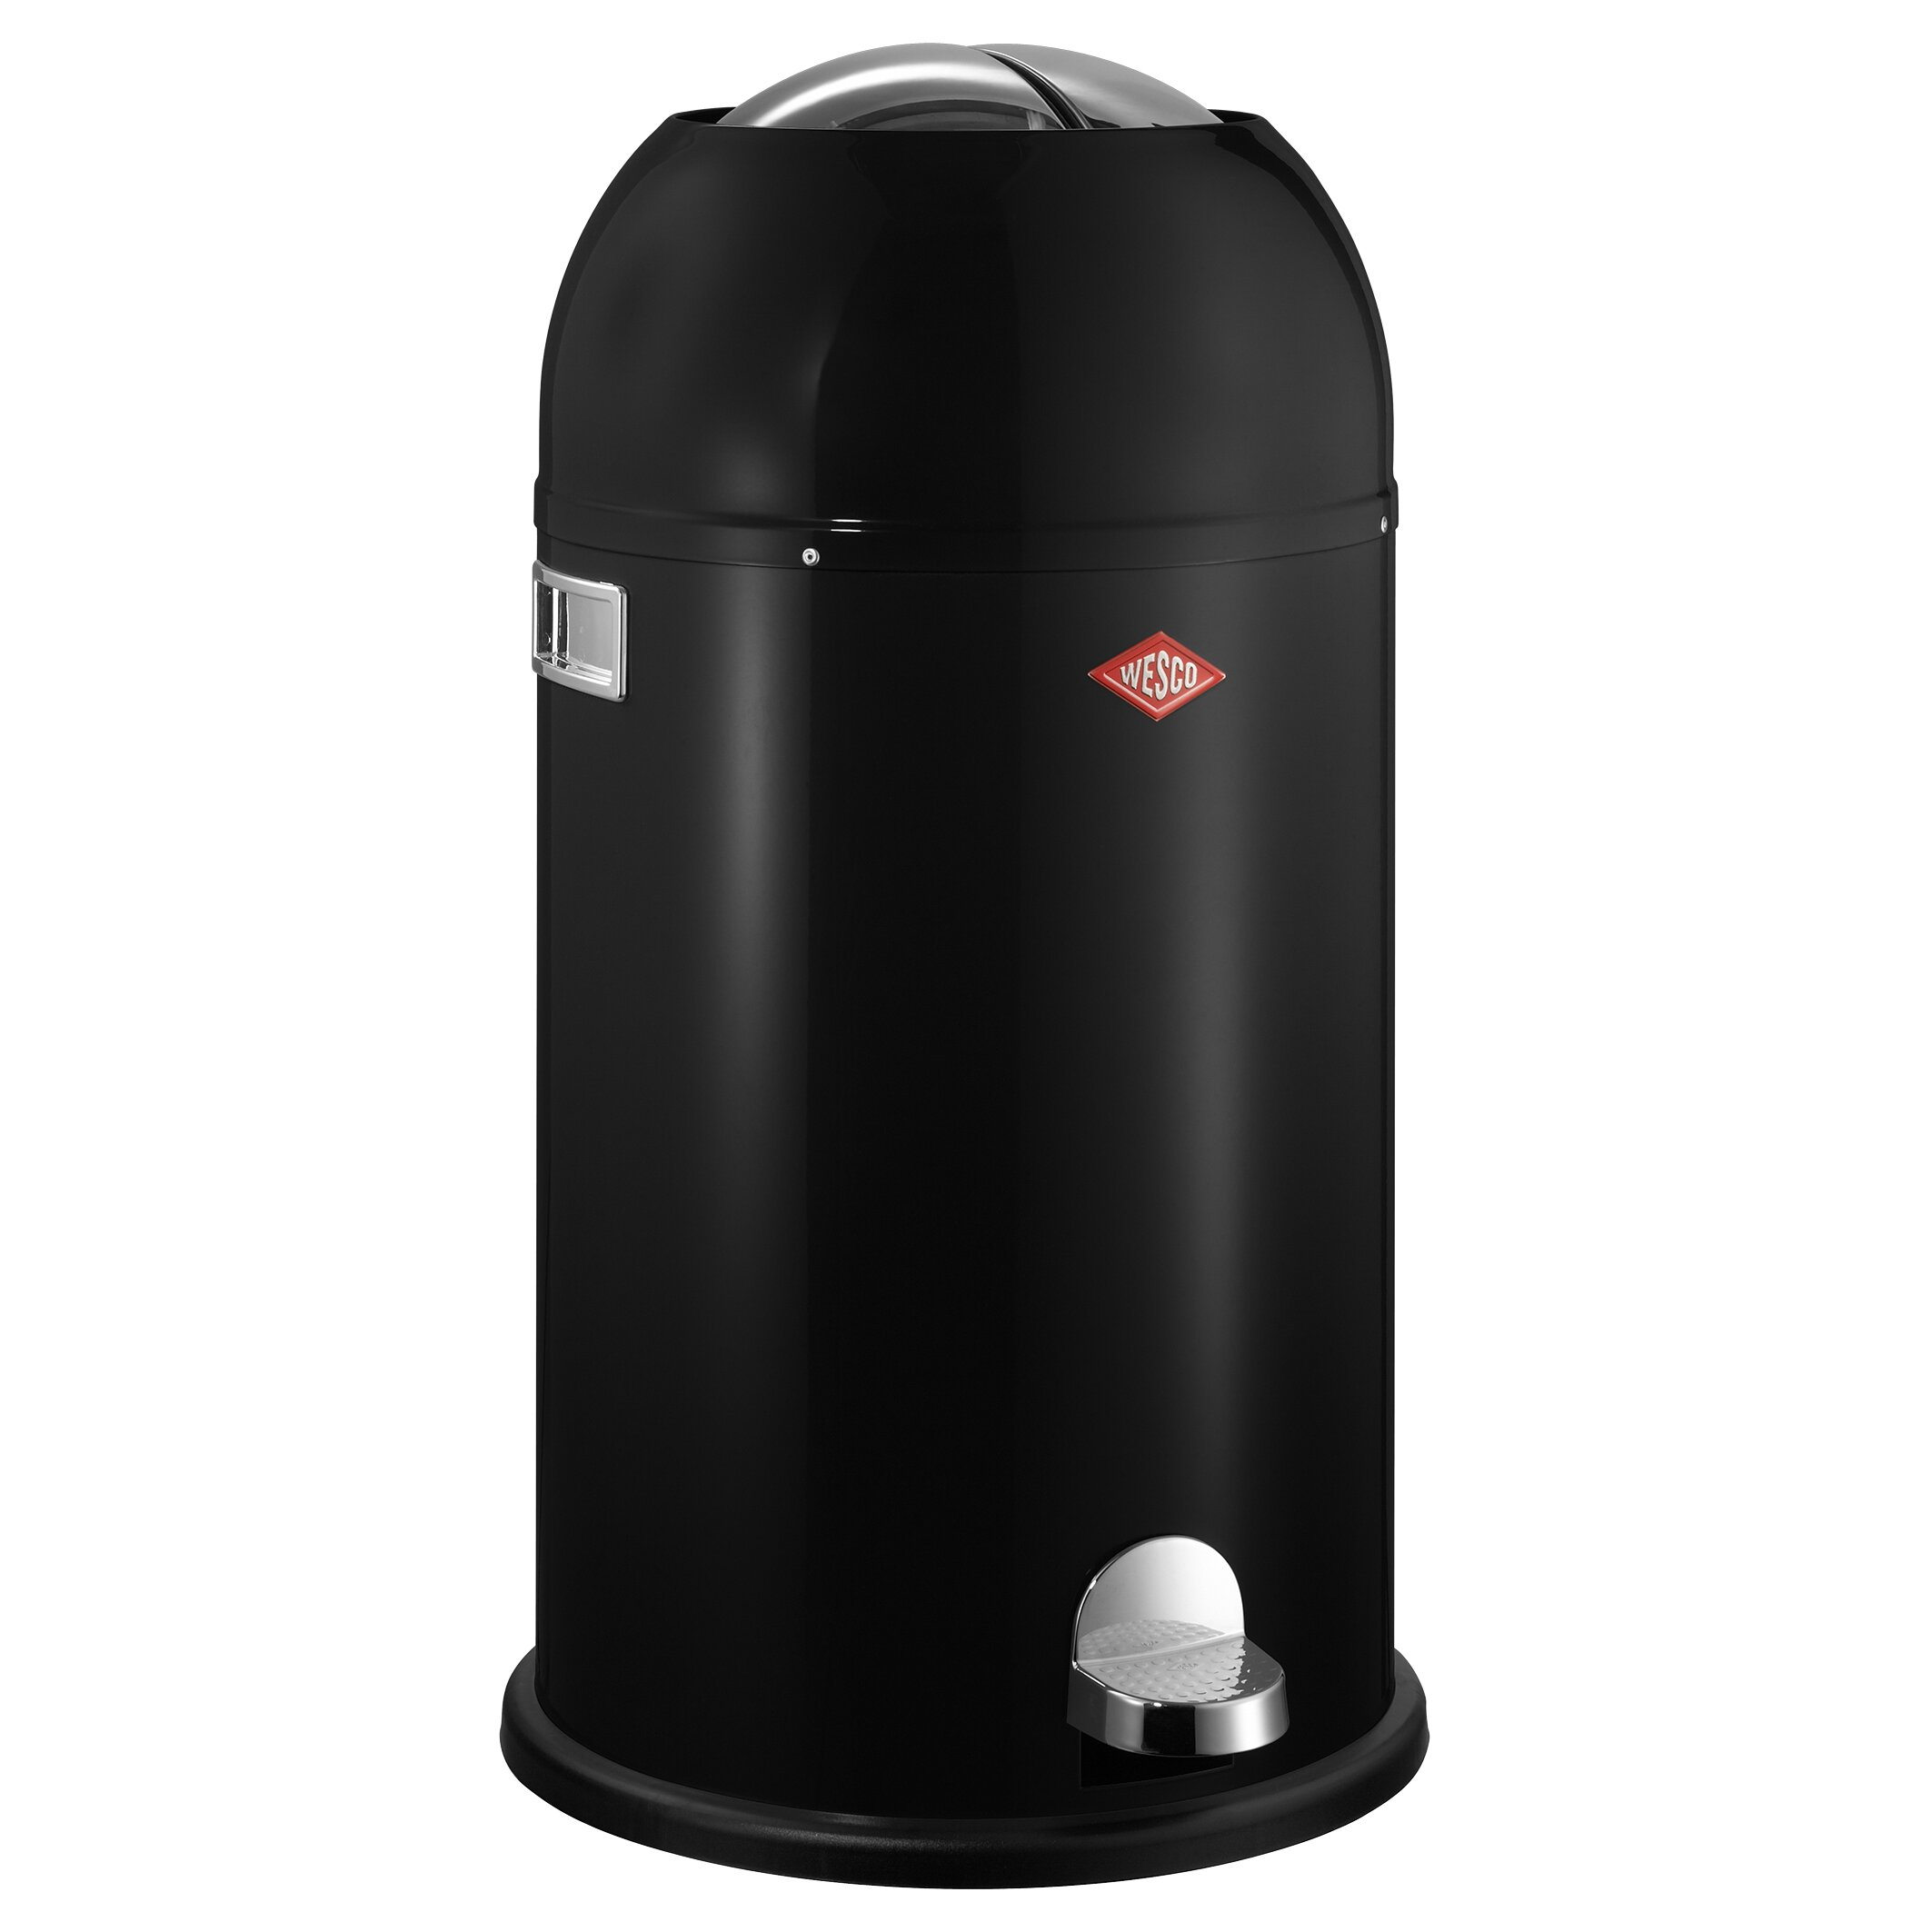 wesco kickmaster 7 5 gallon step on steel trash can reviews. Black Bedroom Furniture Sets. Home Design Ideas